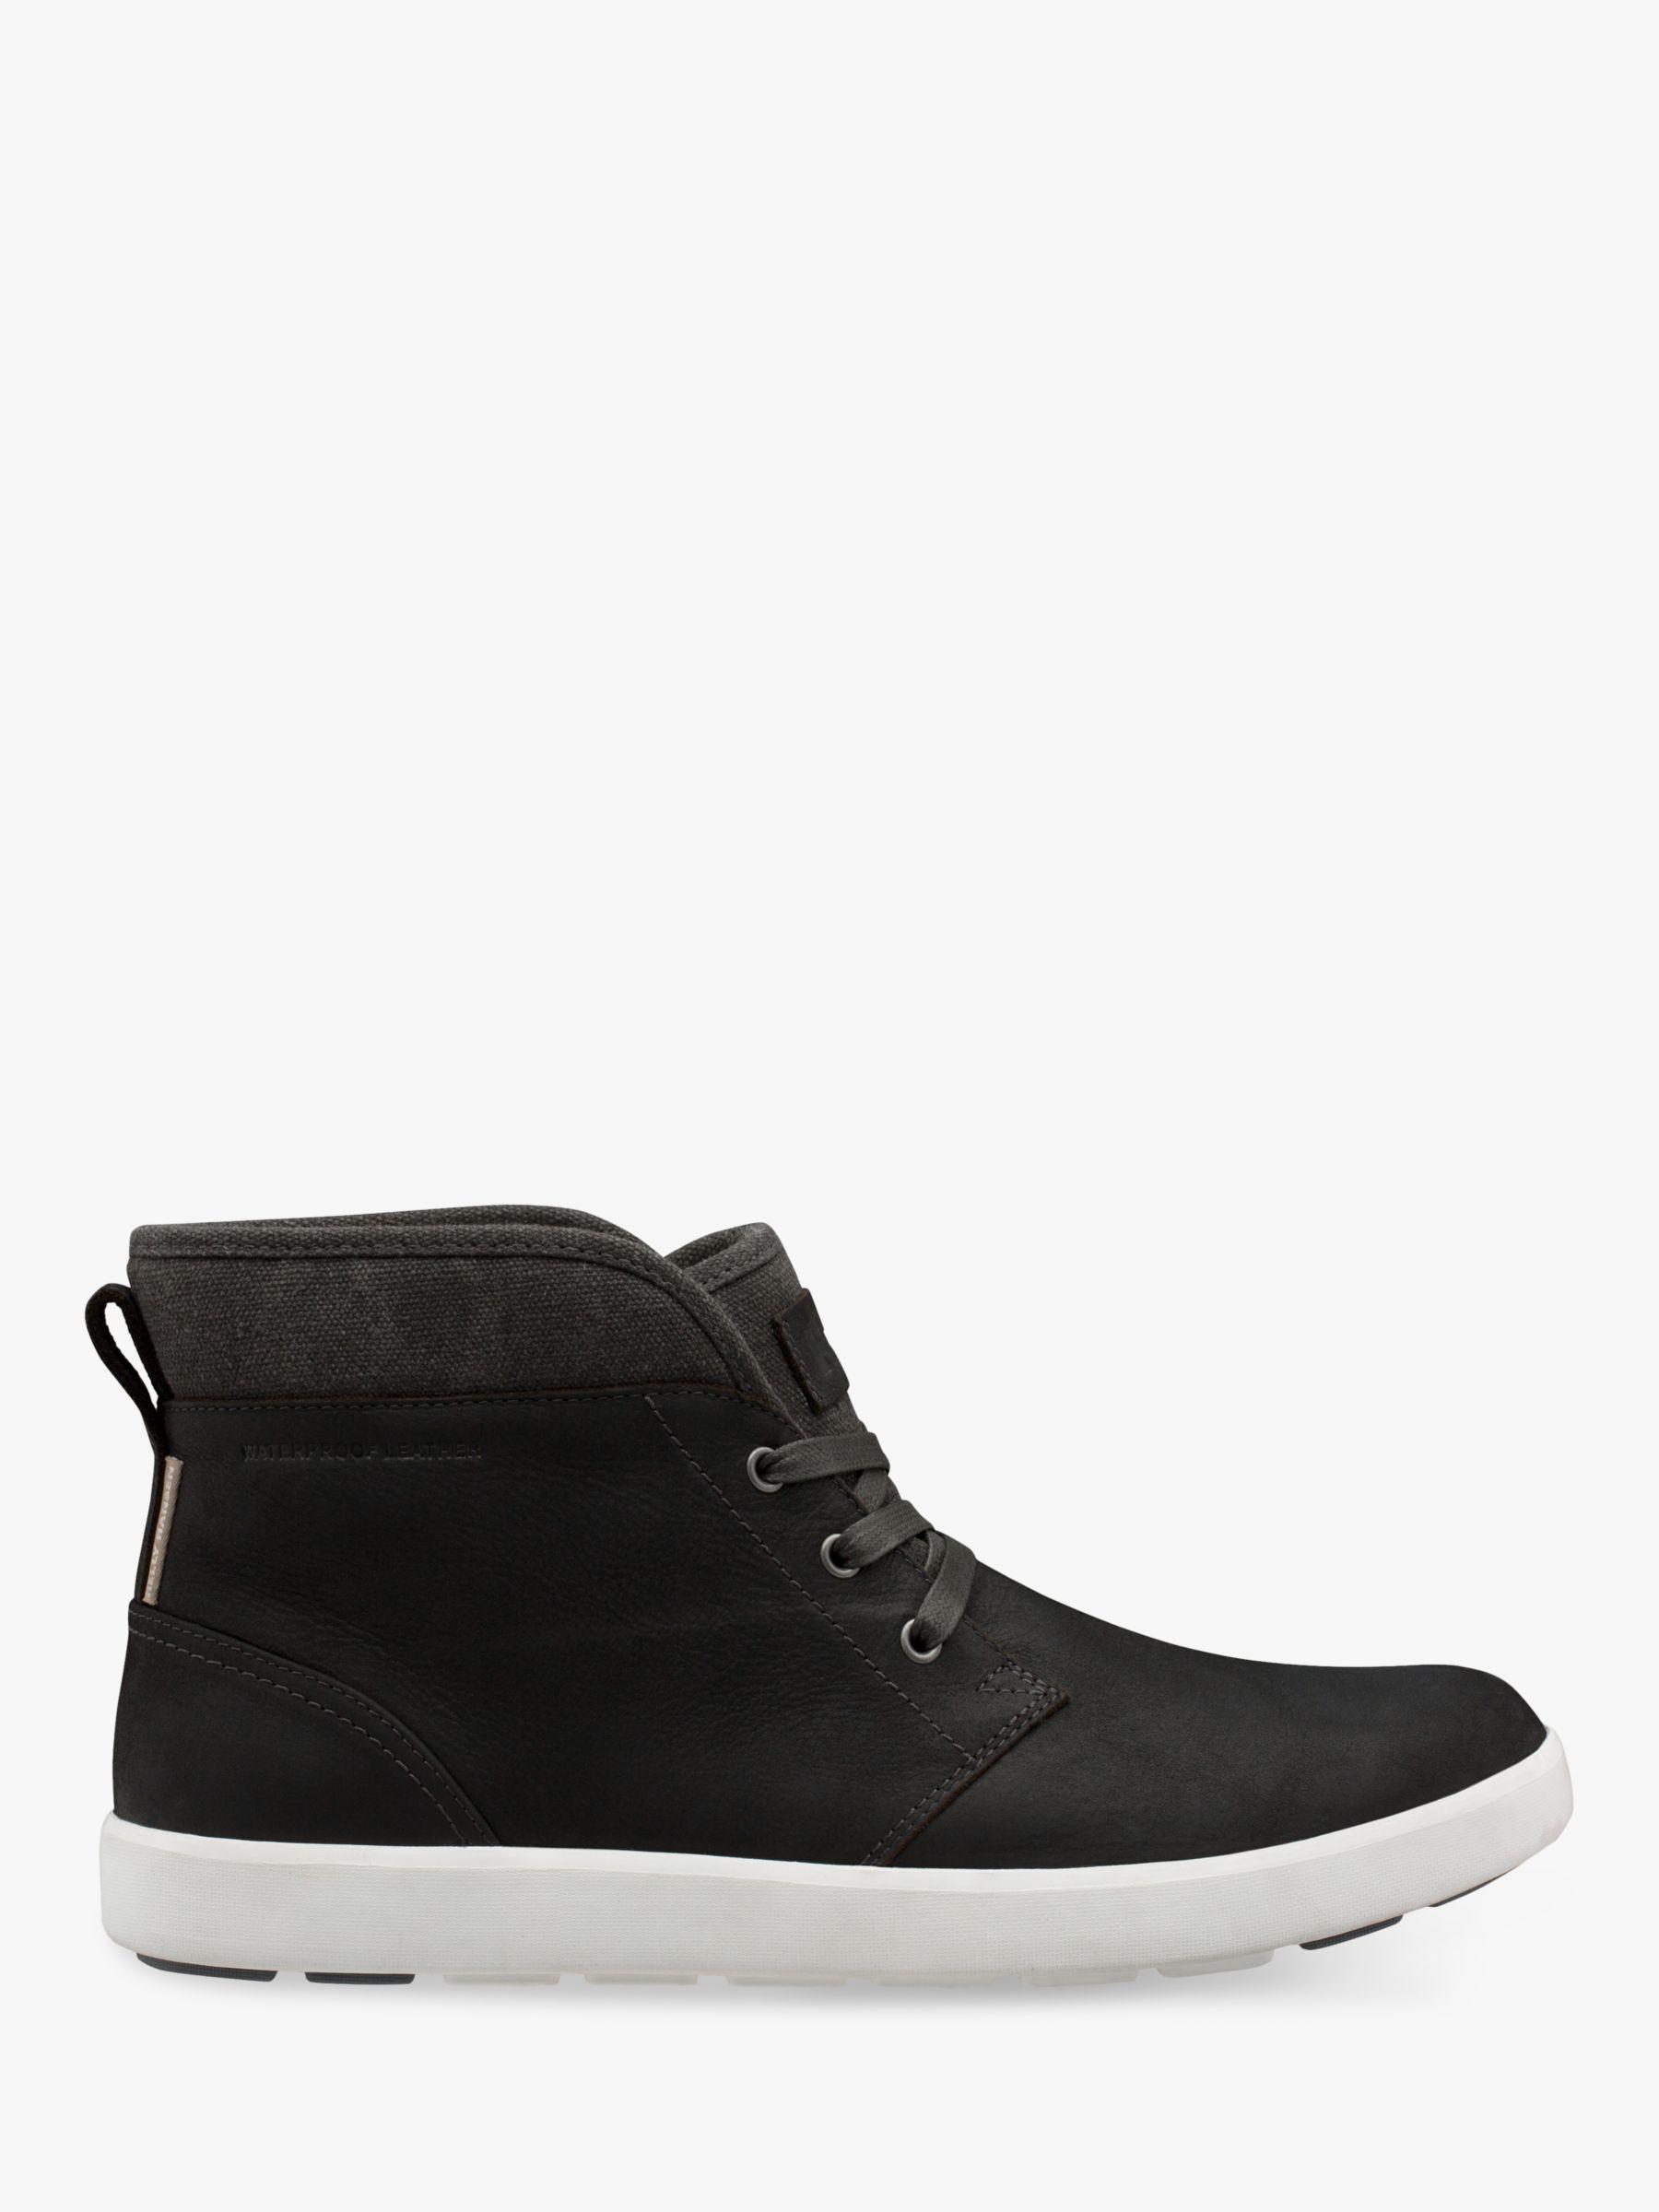 Helly Hansen Helly Hansen Gerton Men's Walking Shoes, Jet Black/Off White/Charcoal